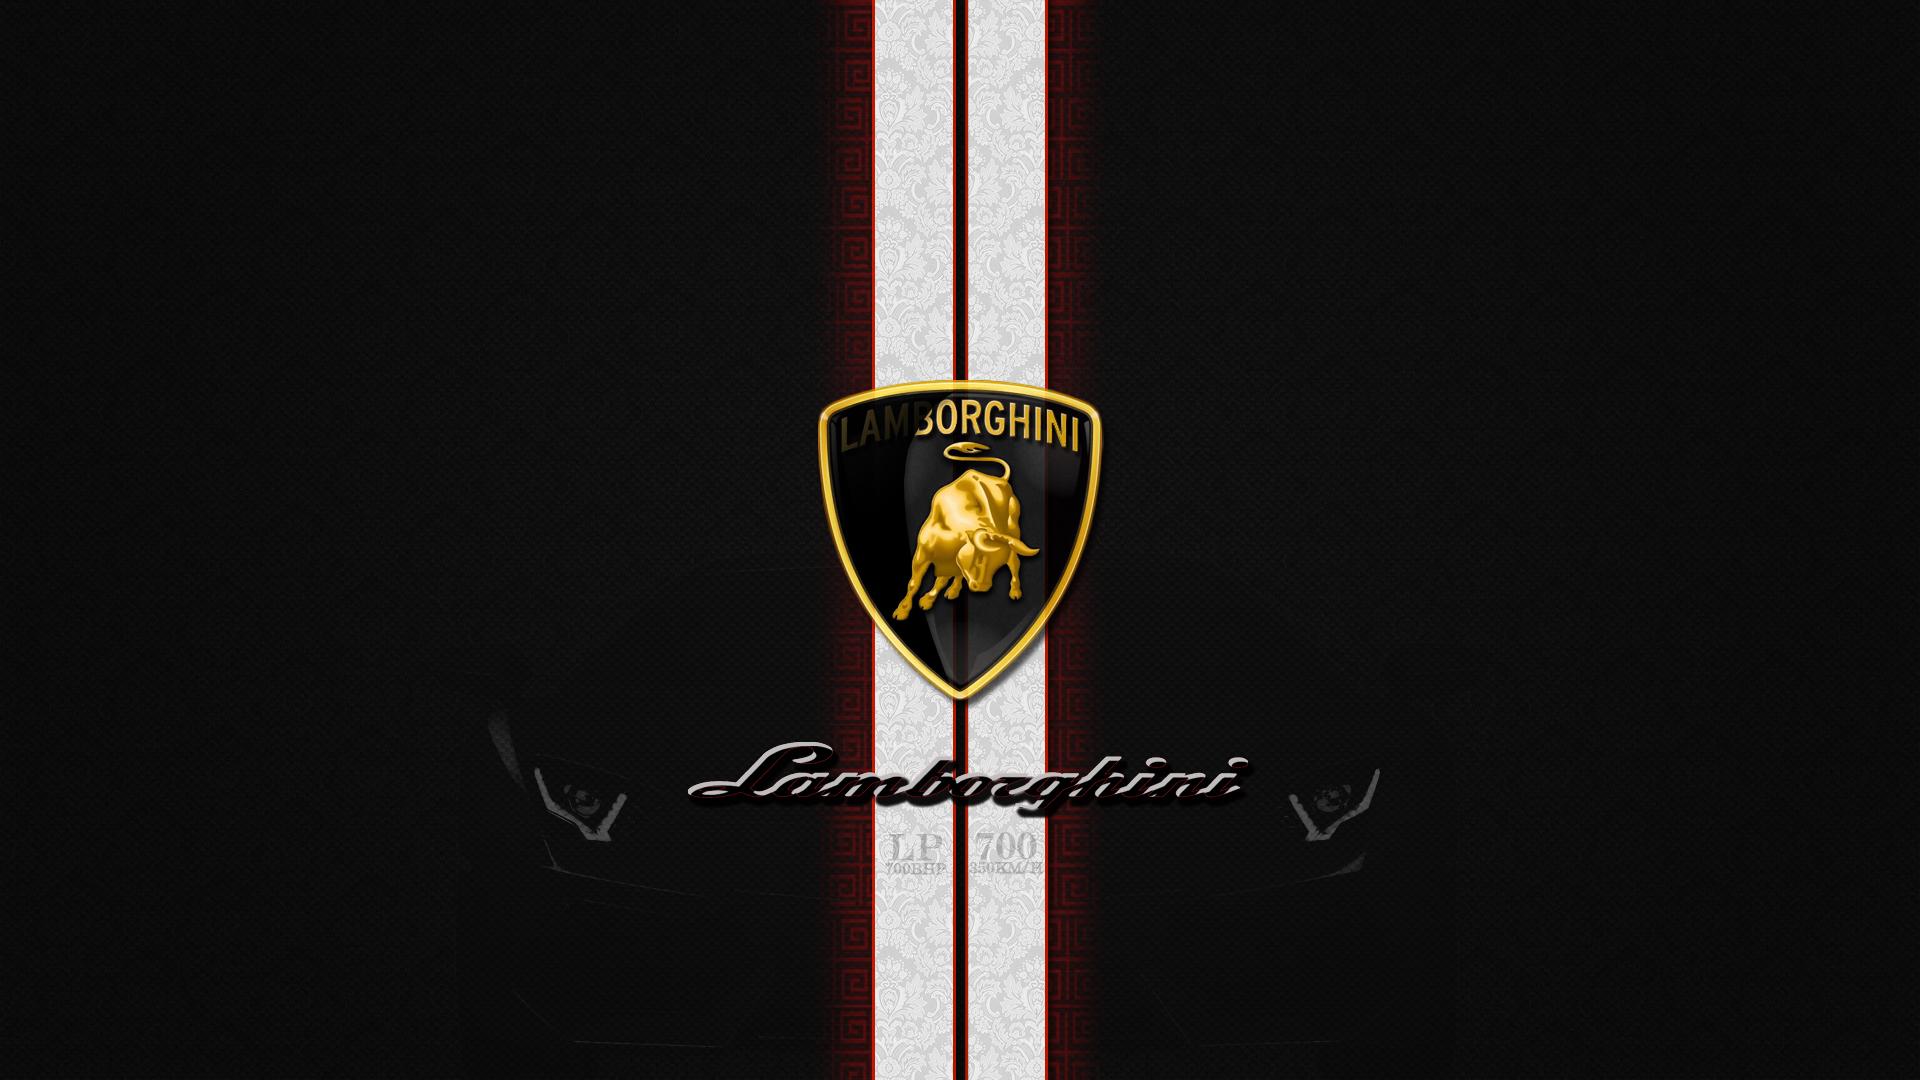 Lamborghini Logo wallpaper 237947 1920x1080